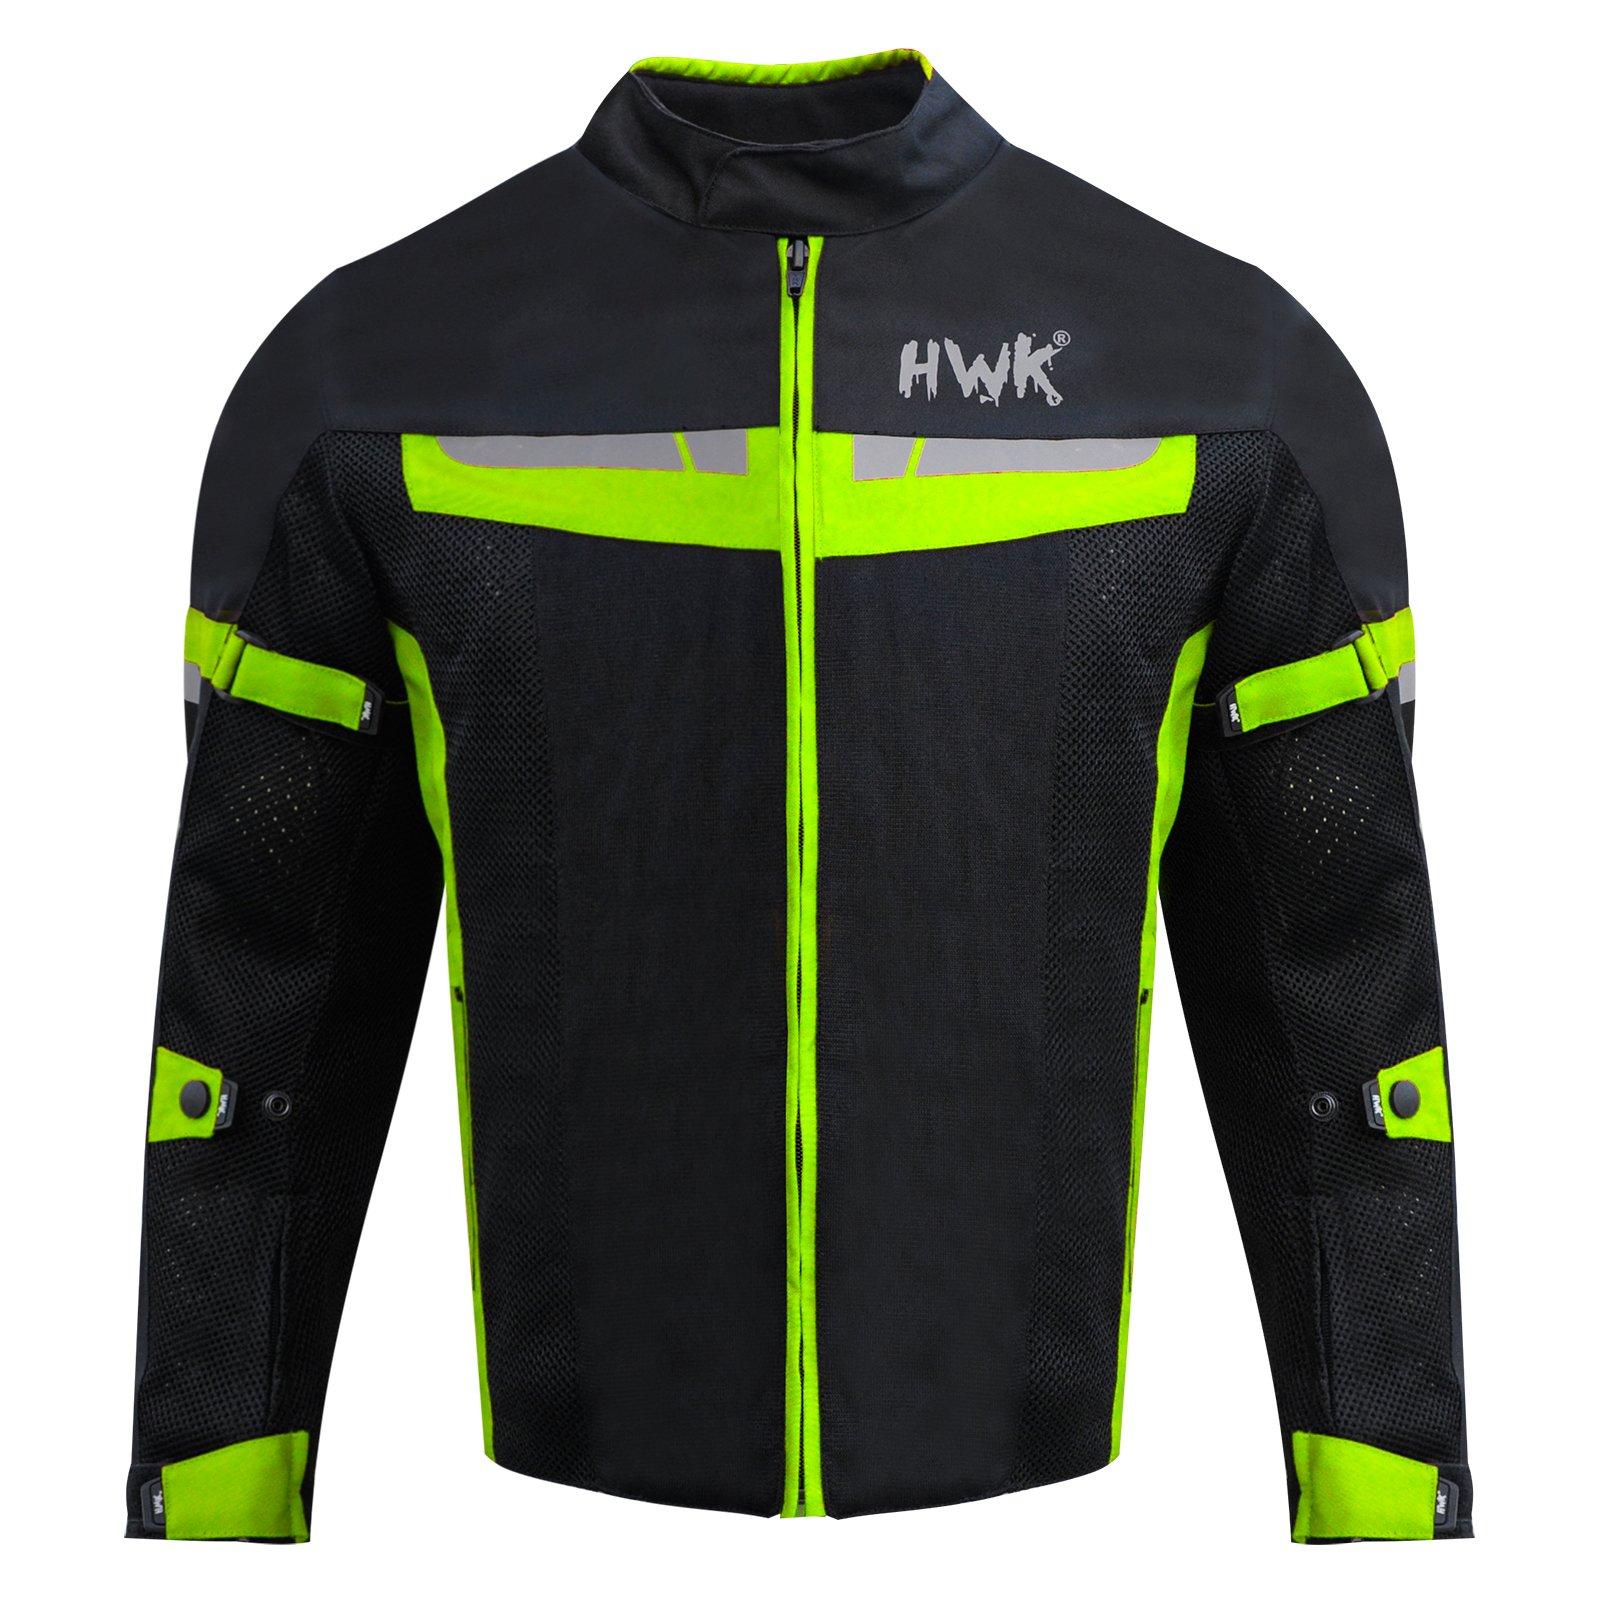 HWK Motorsports Direct Mesh Motorcycle Jacket Coat Motorbike Jacket Biker Cordura Waterproof CE Armoured Breathable 100% Waterproof Reissa Membrane 1 YEAR WARRANTY!! (Medium, Green)